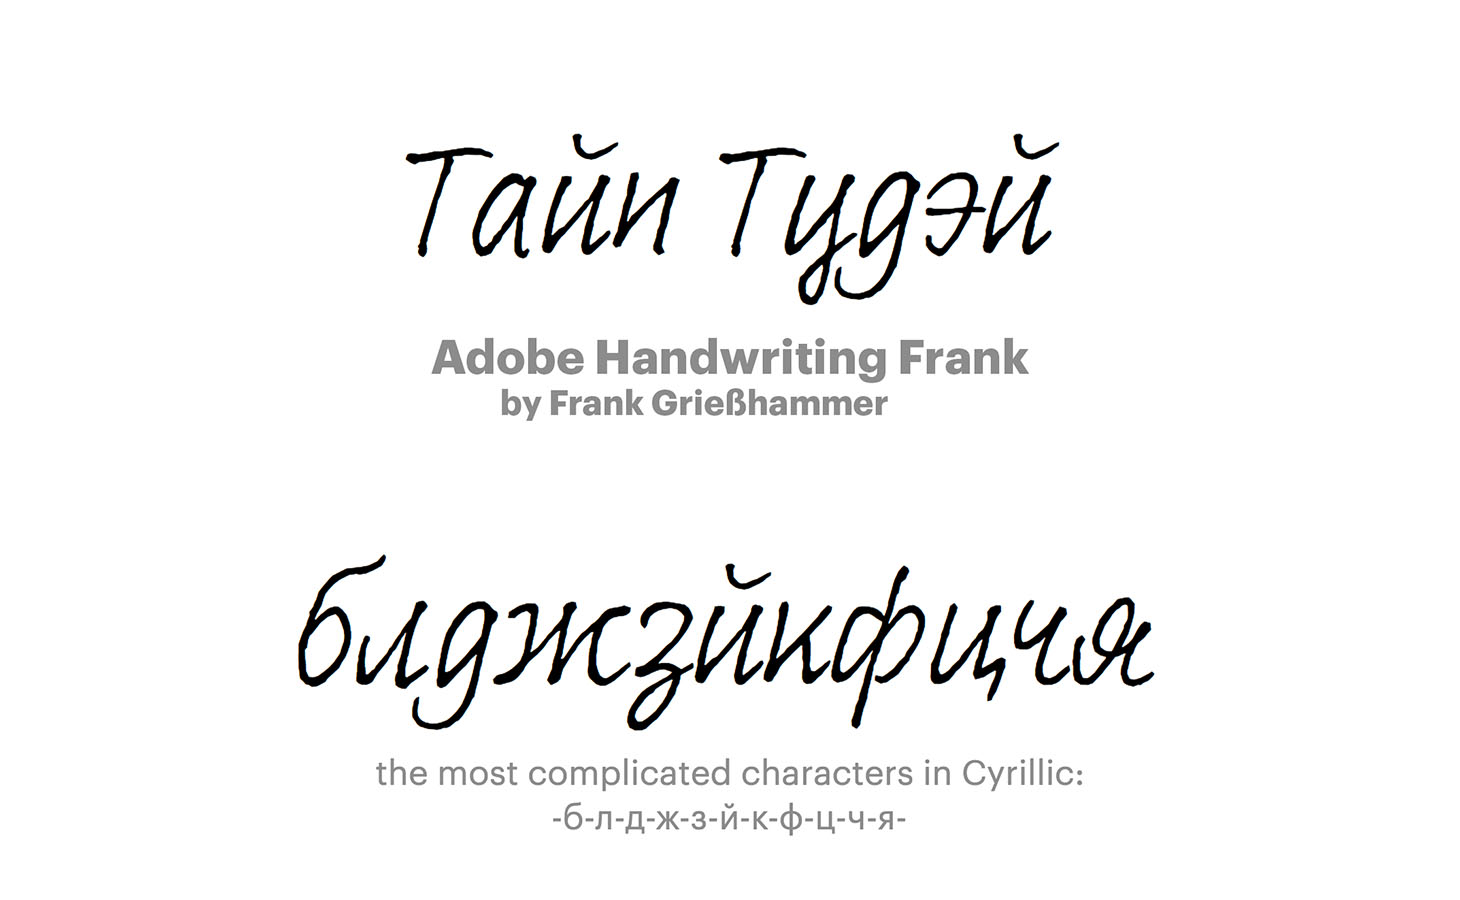 Adobe-Handwriting-Frank